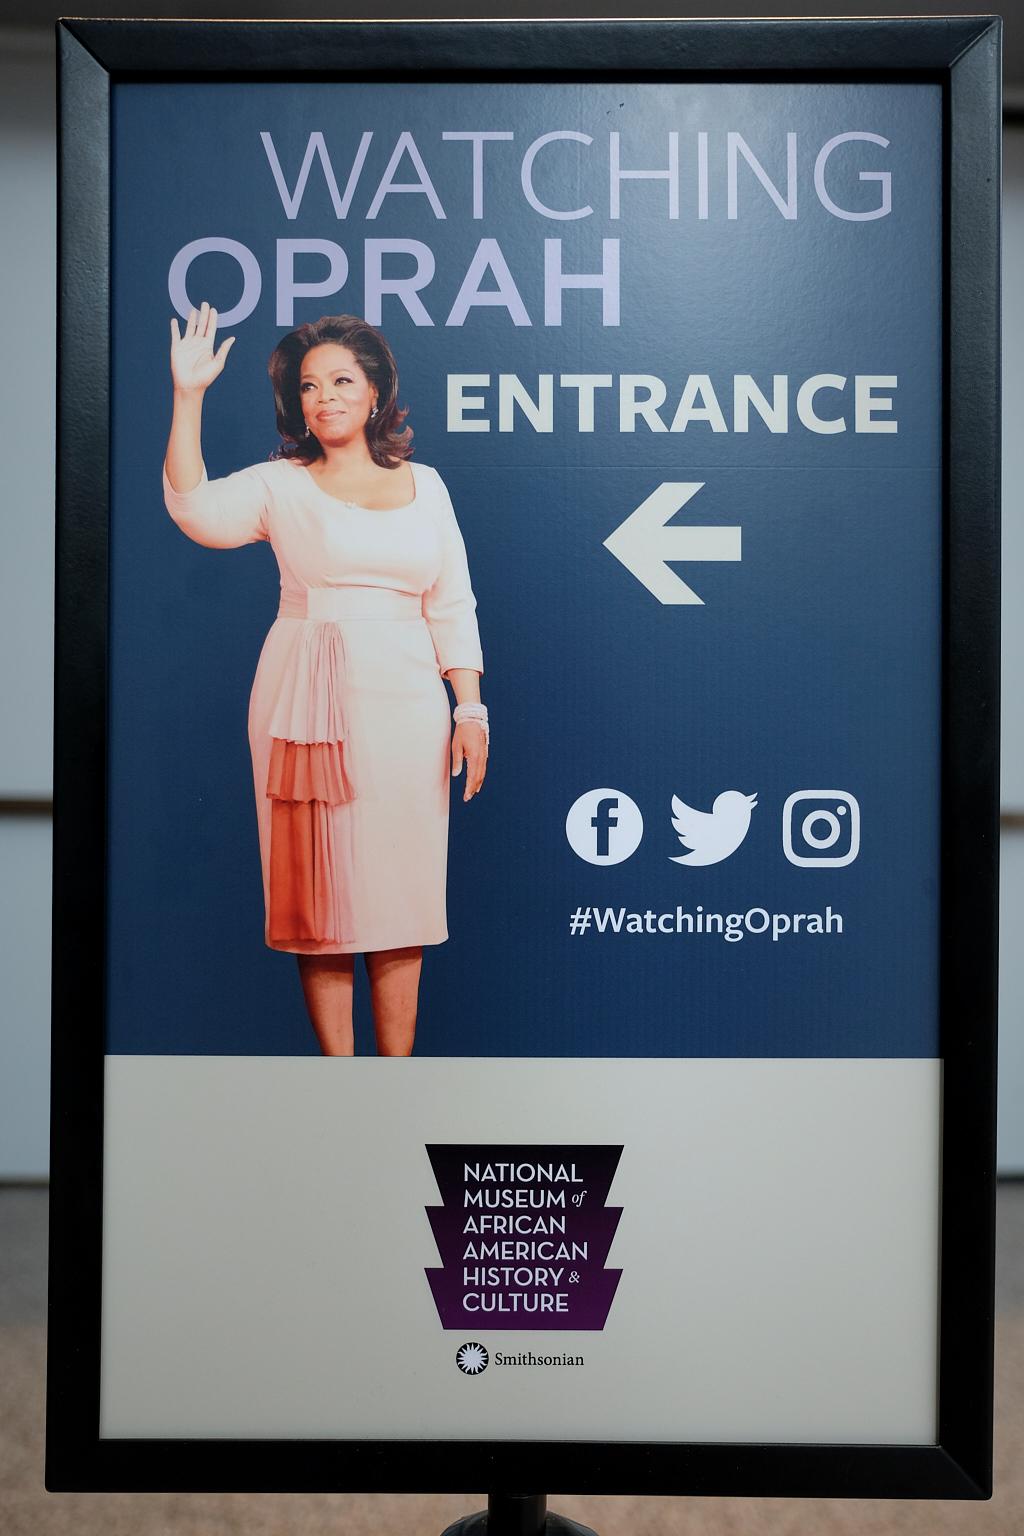 NMAAHC_Oprah_Exhibit_2018-09-26-001.jpg